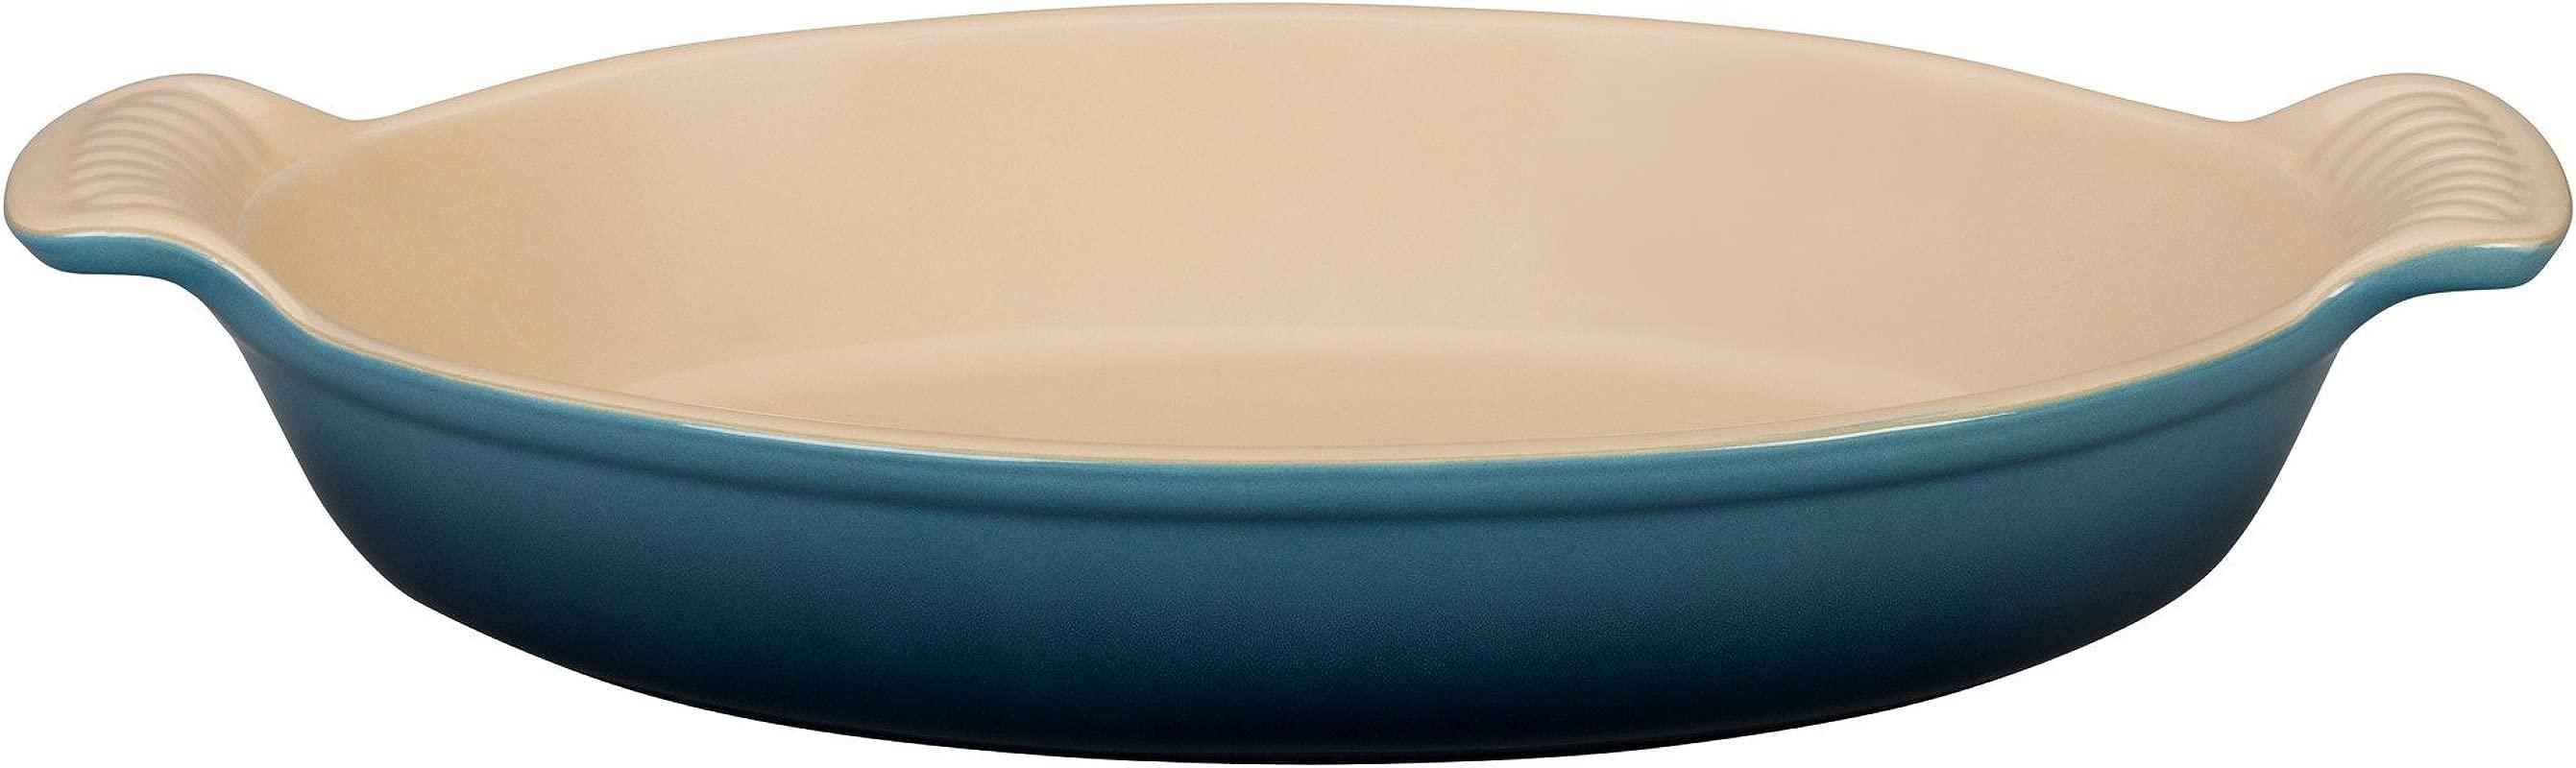 Le Creuset Stoneware Heritage Oval 24OZ Au Gratin Dish Marine